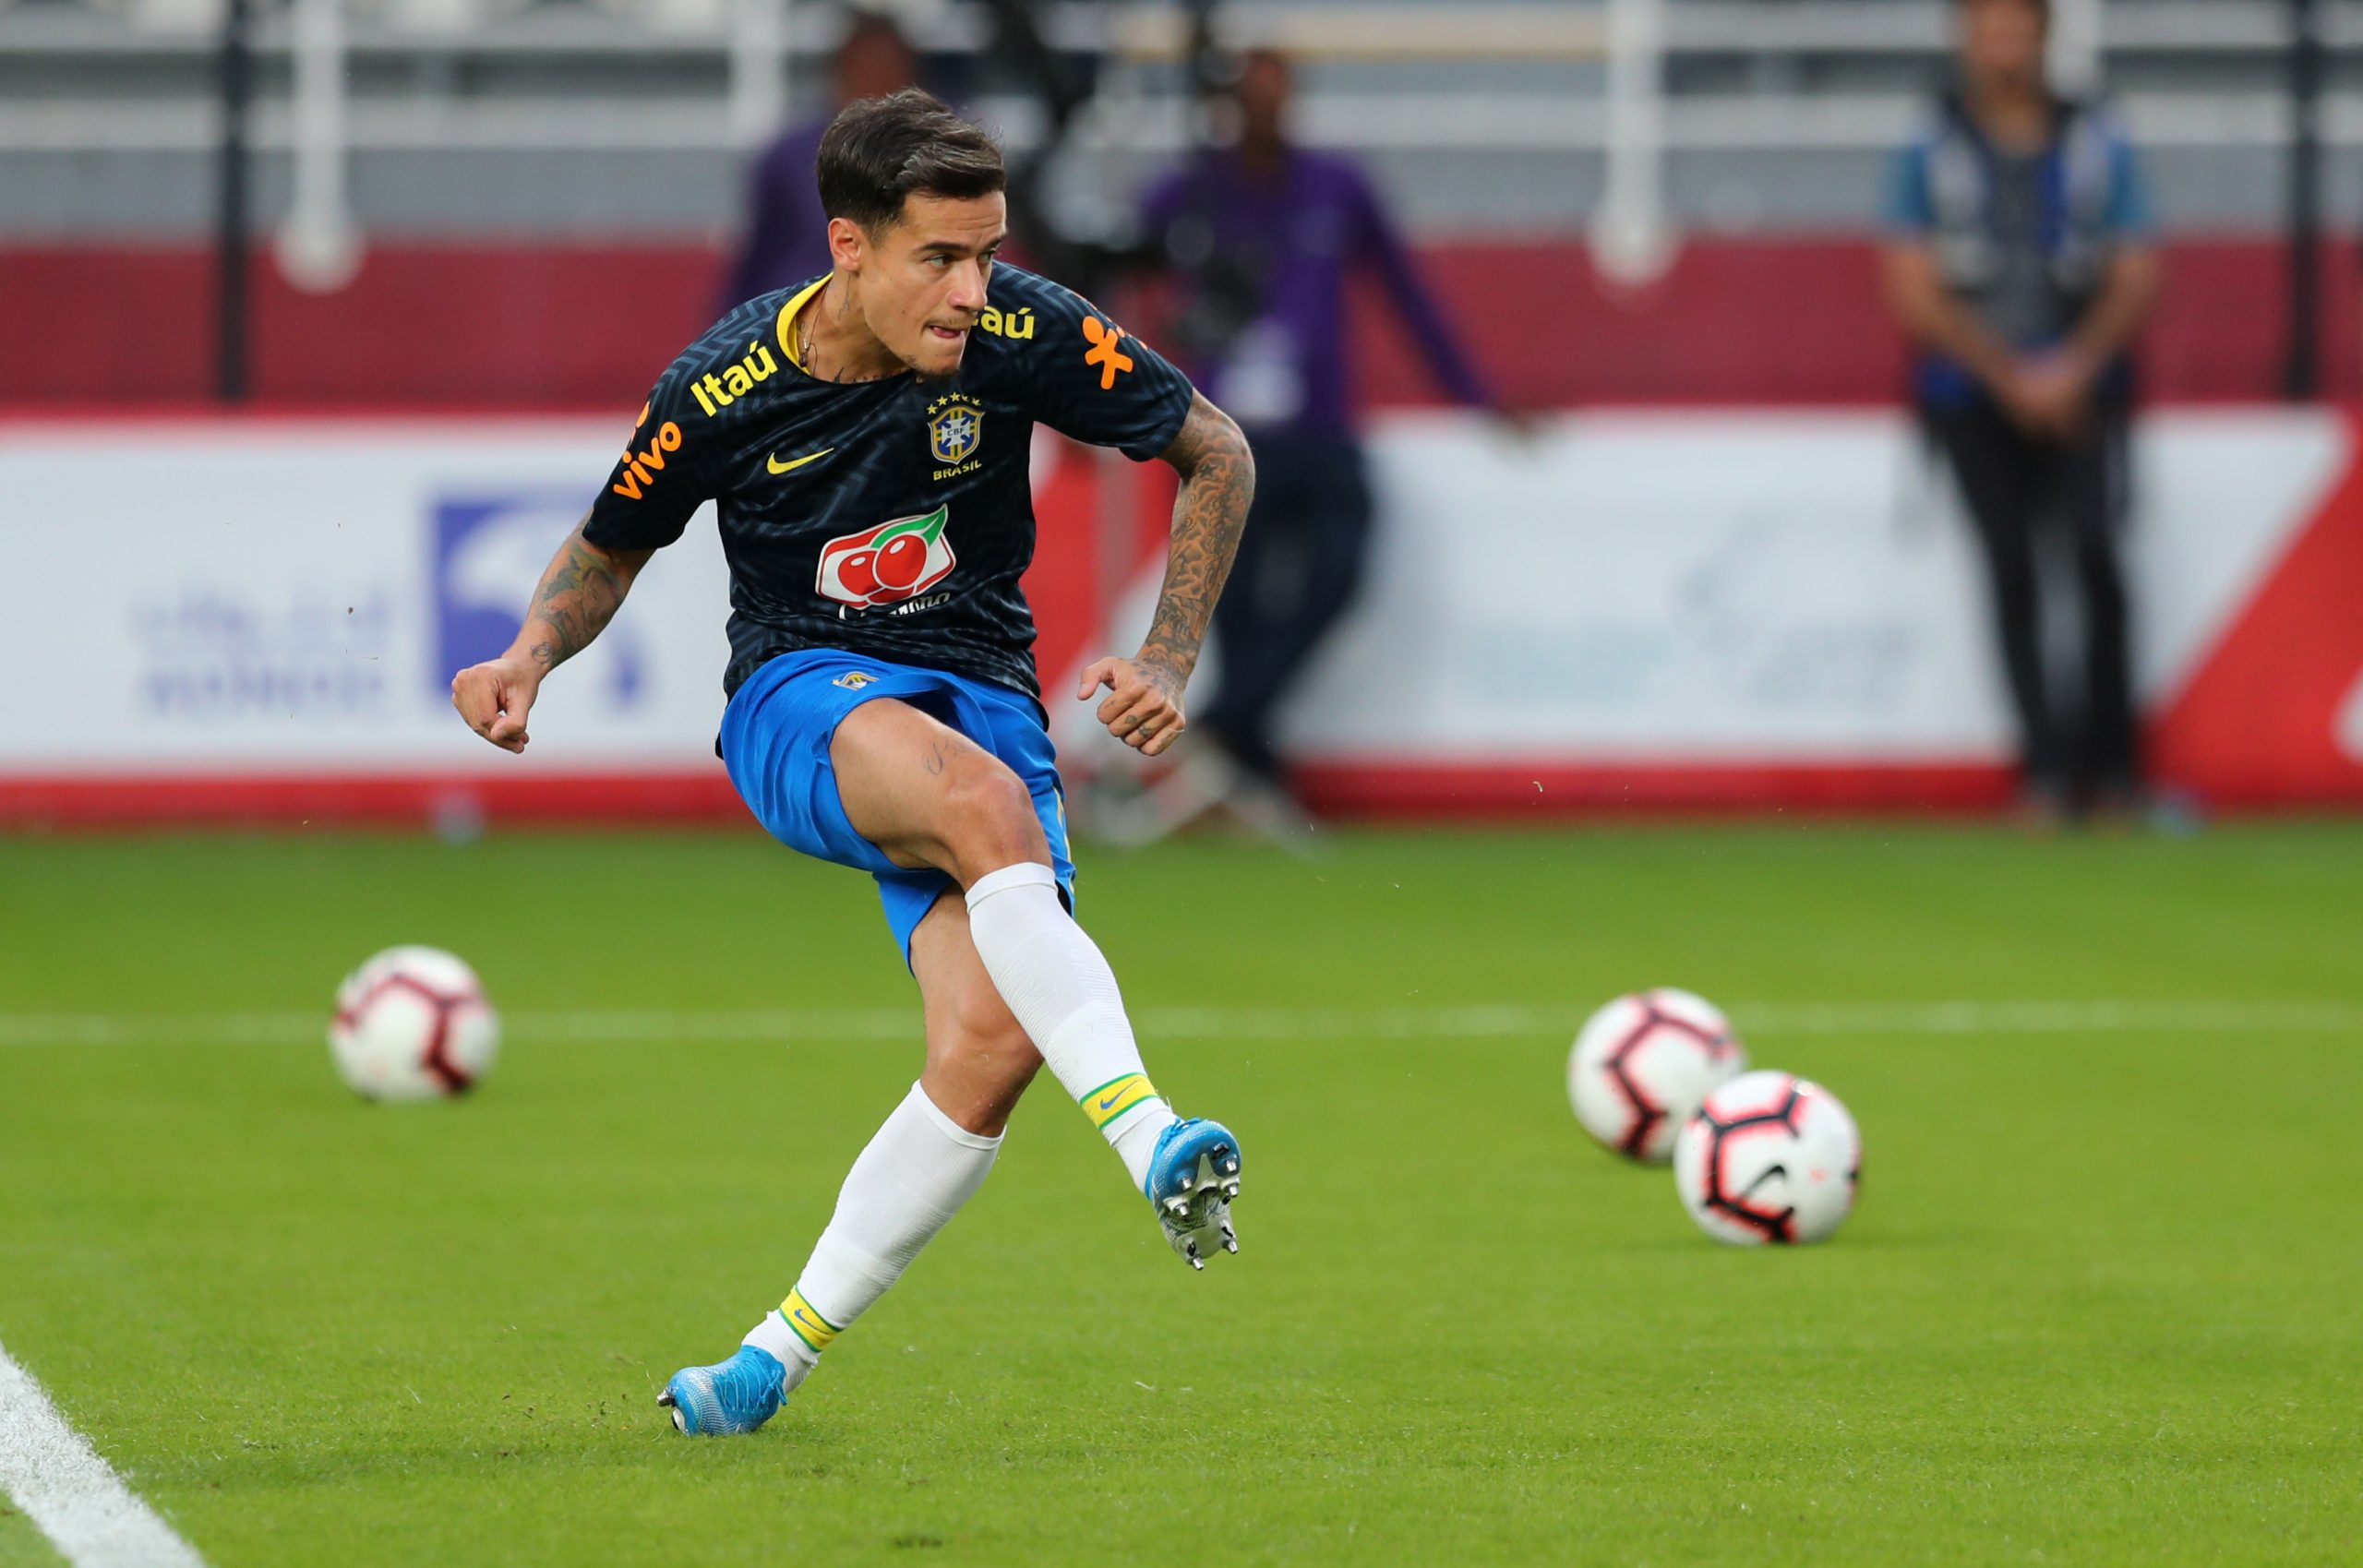 Barcelona Transfers List 2019/20